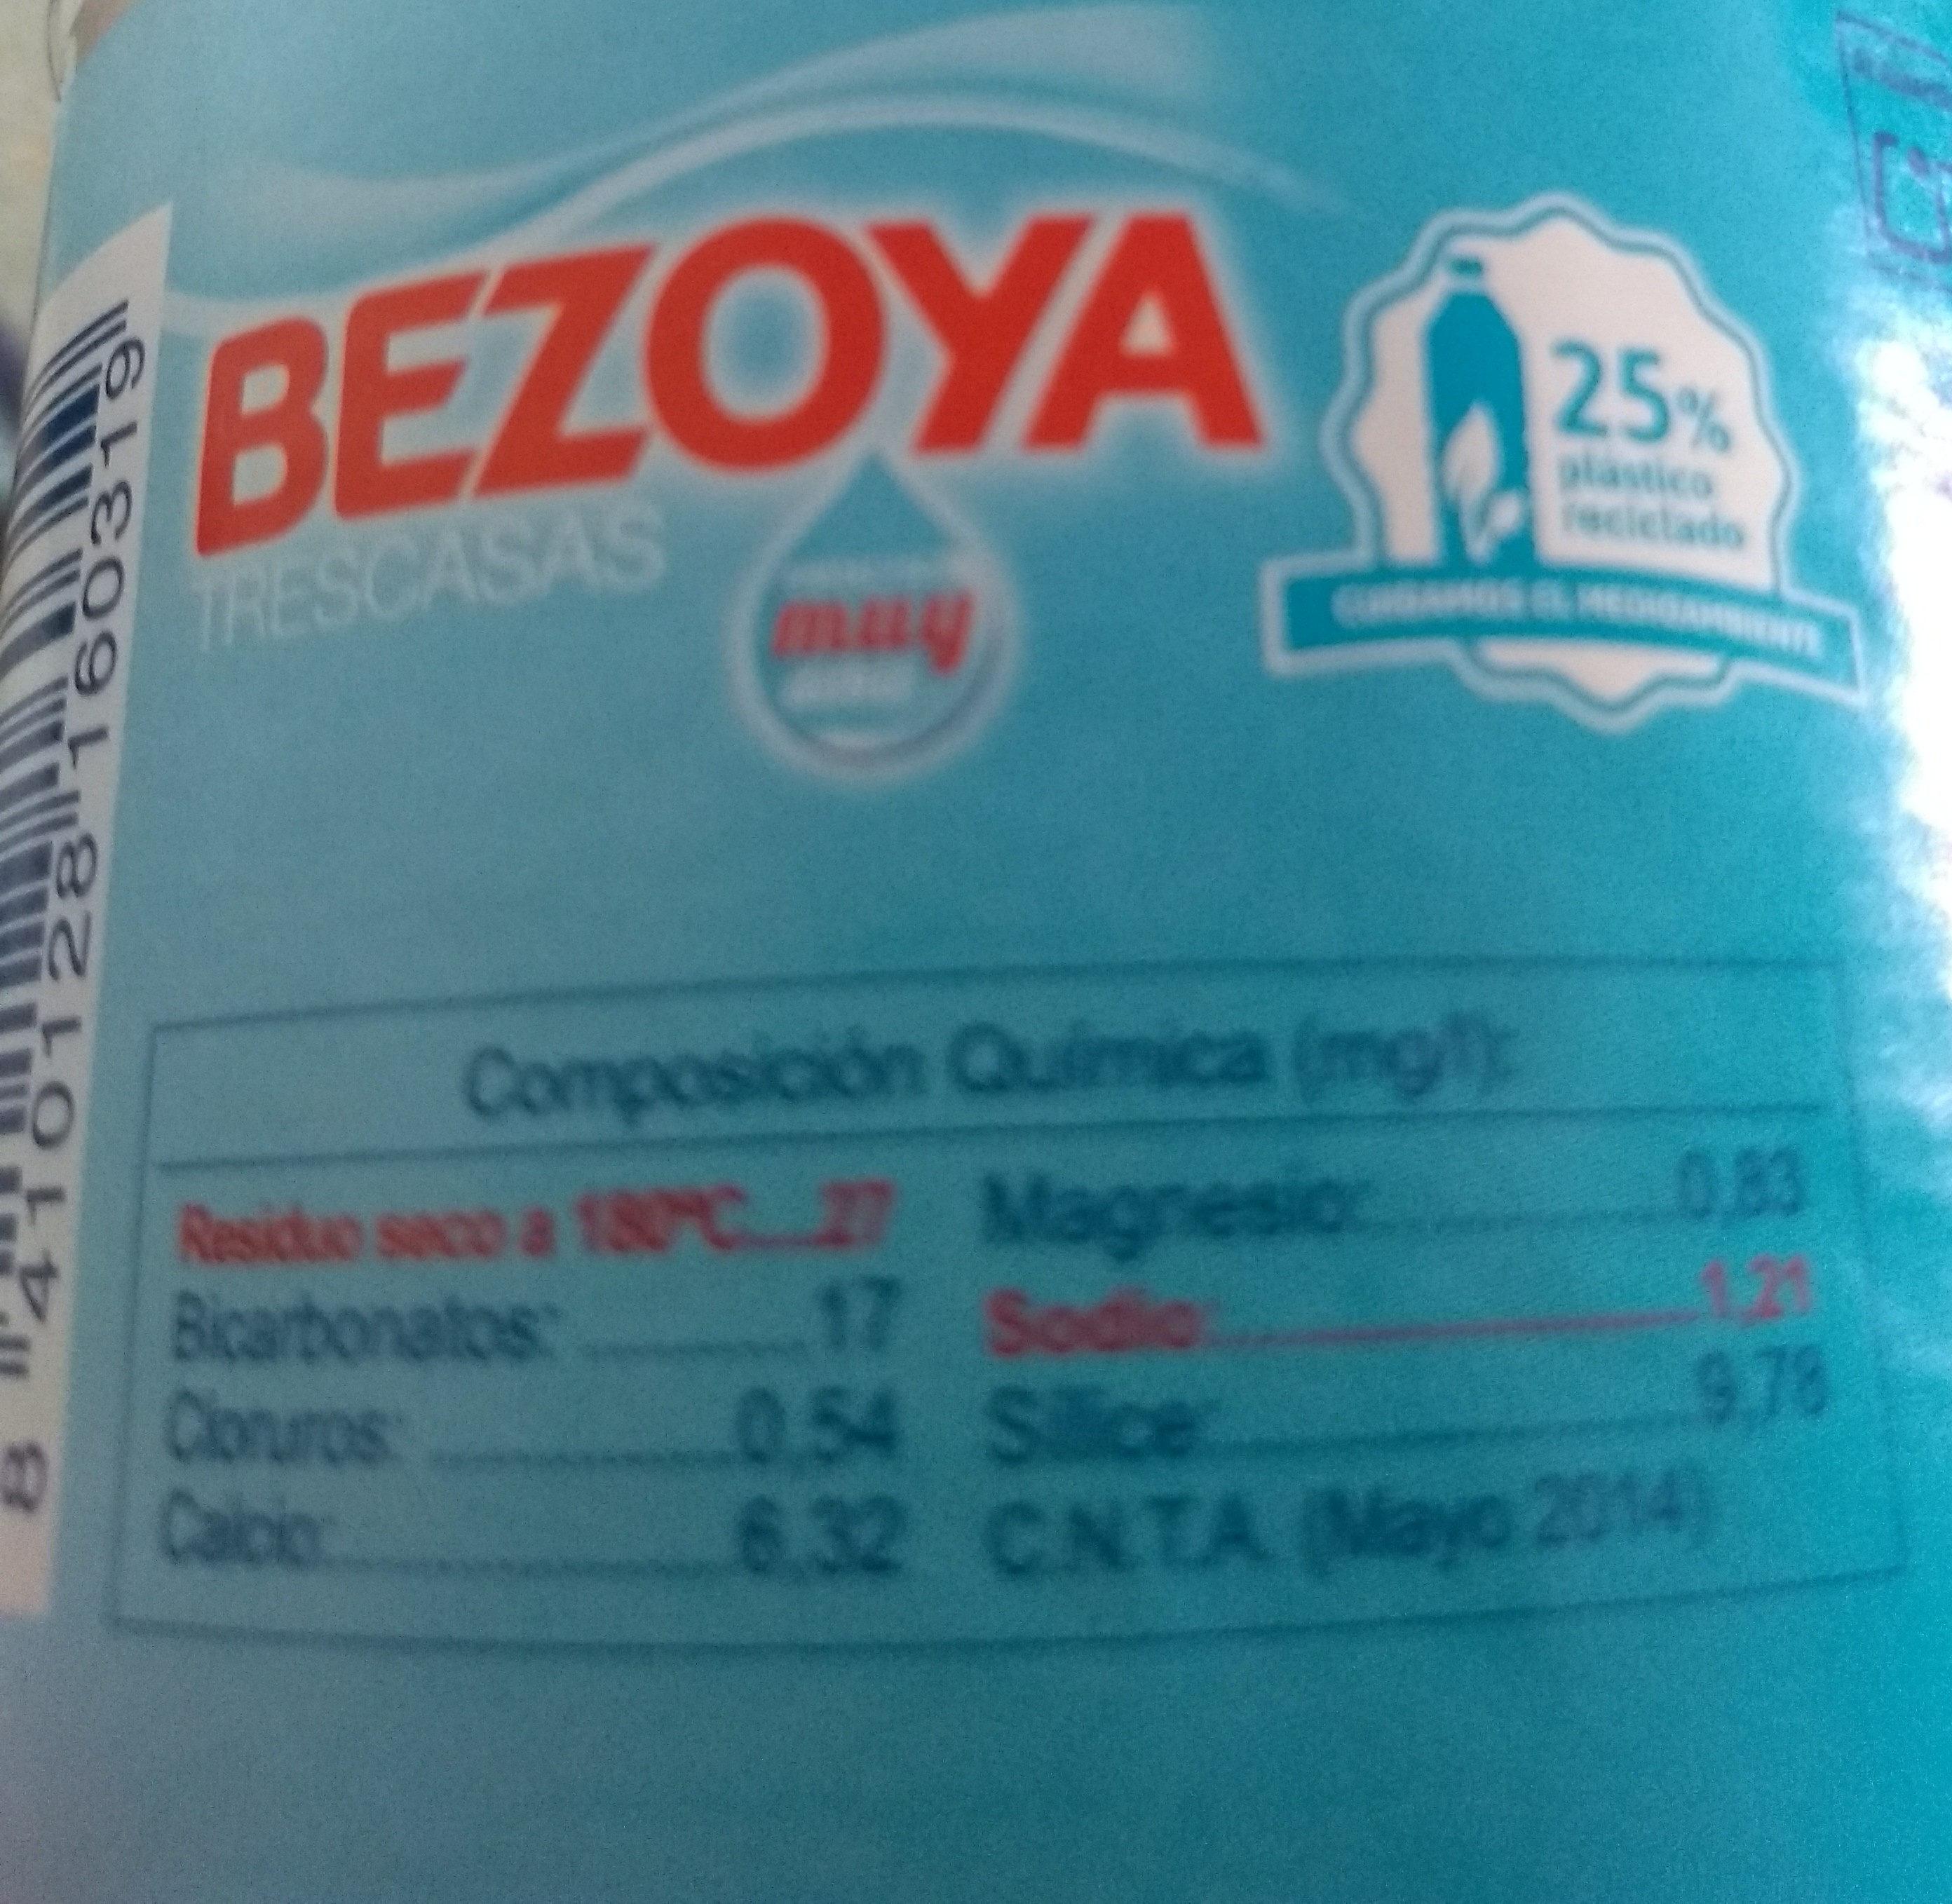 Agua mineral natural de mineralización muy débil - Nutrition facts - es